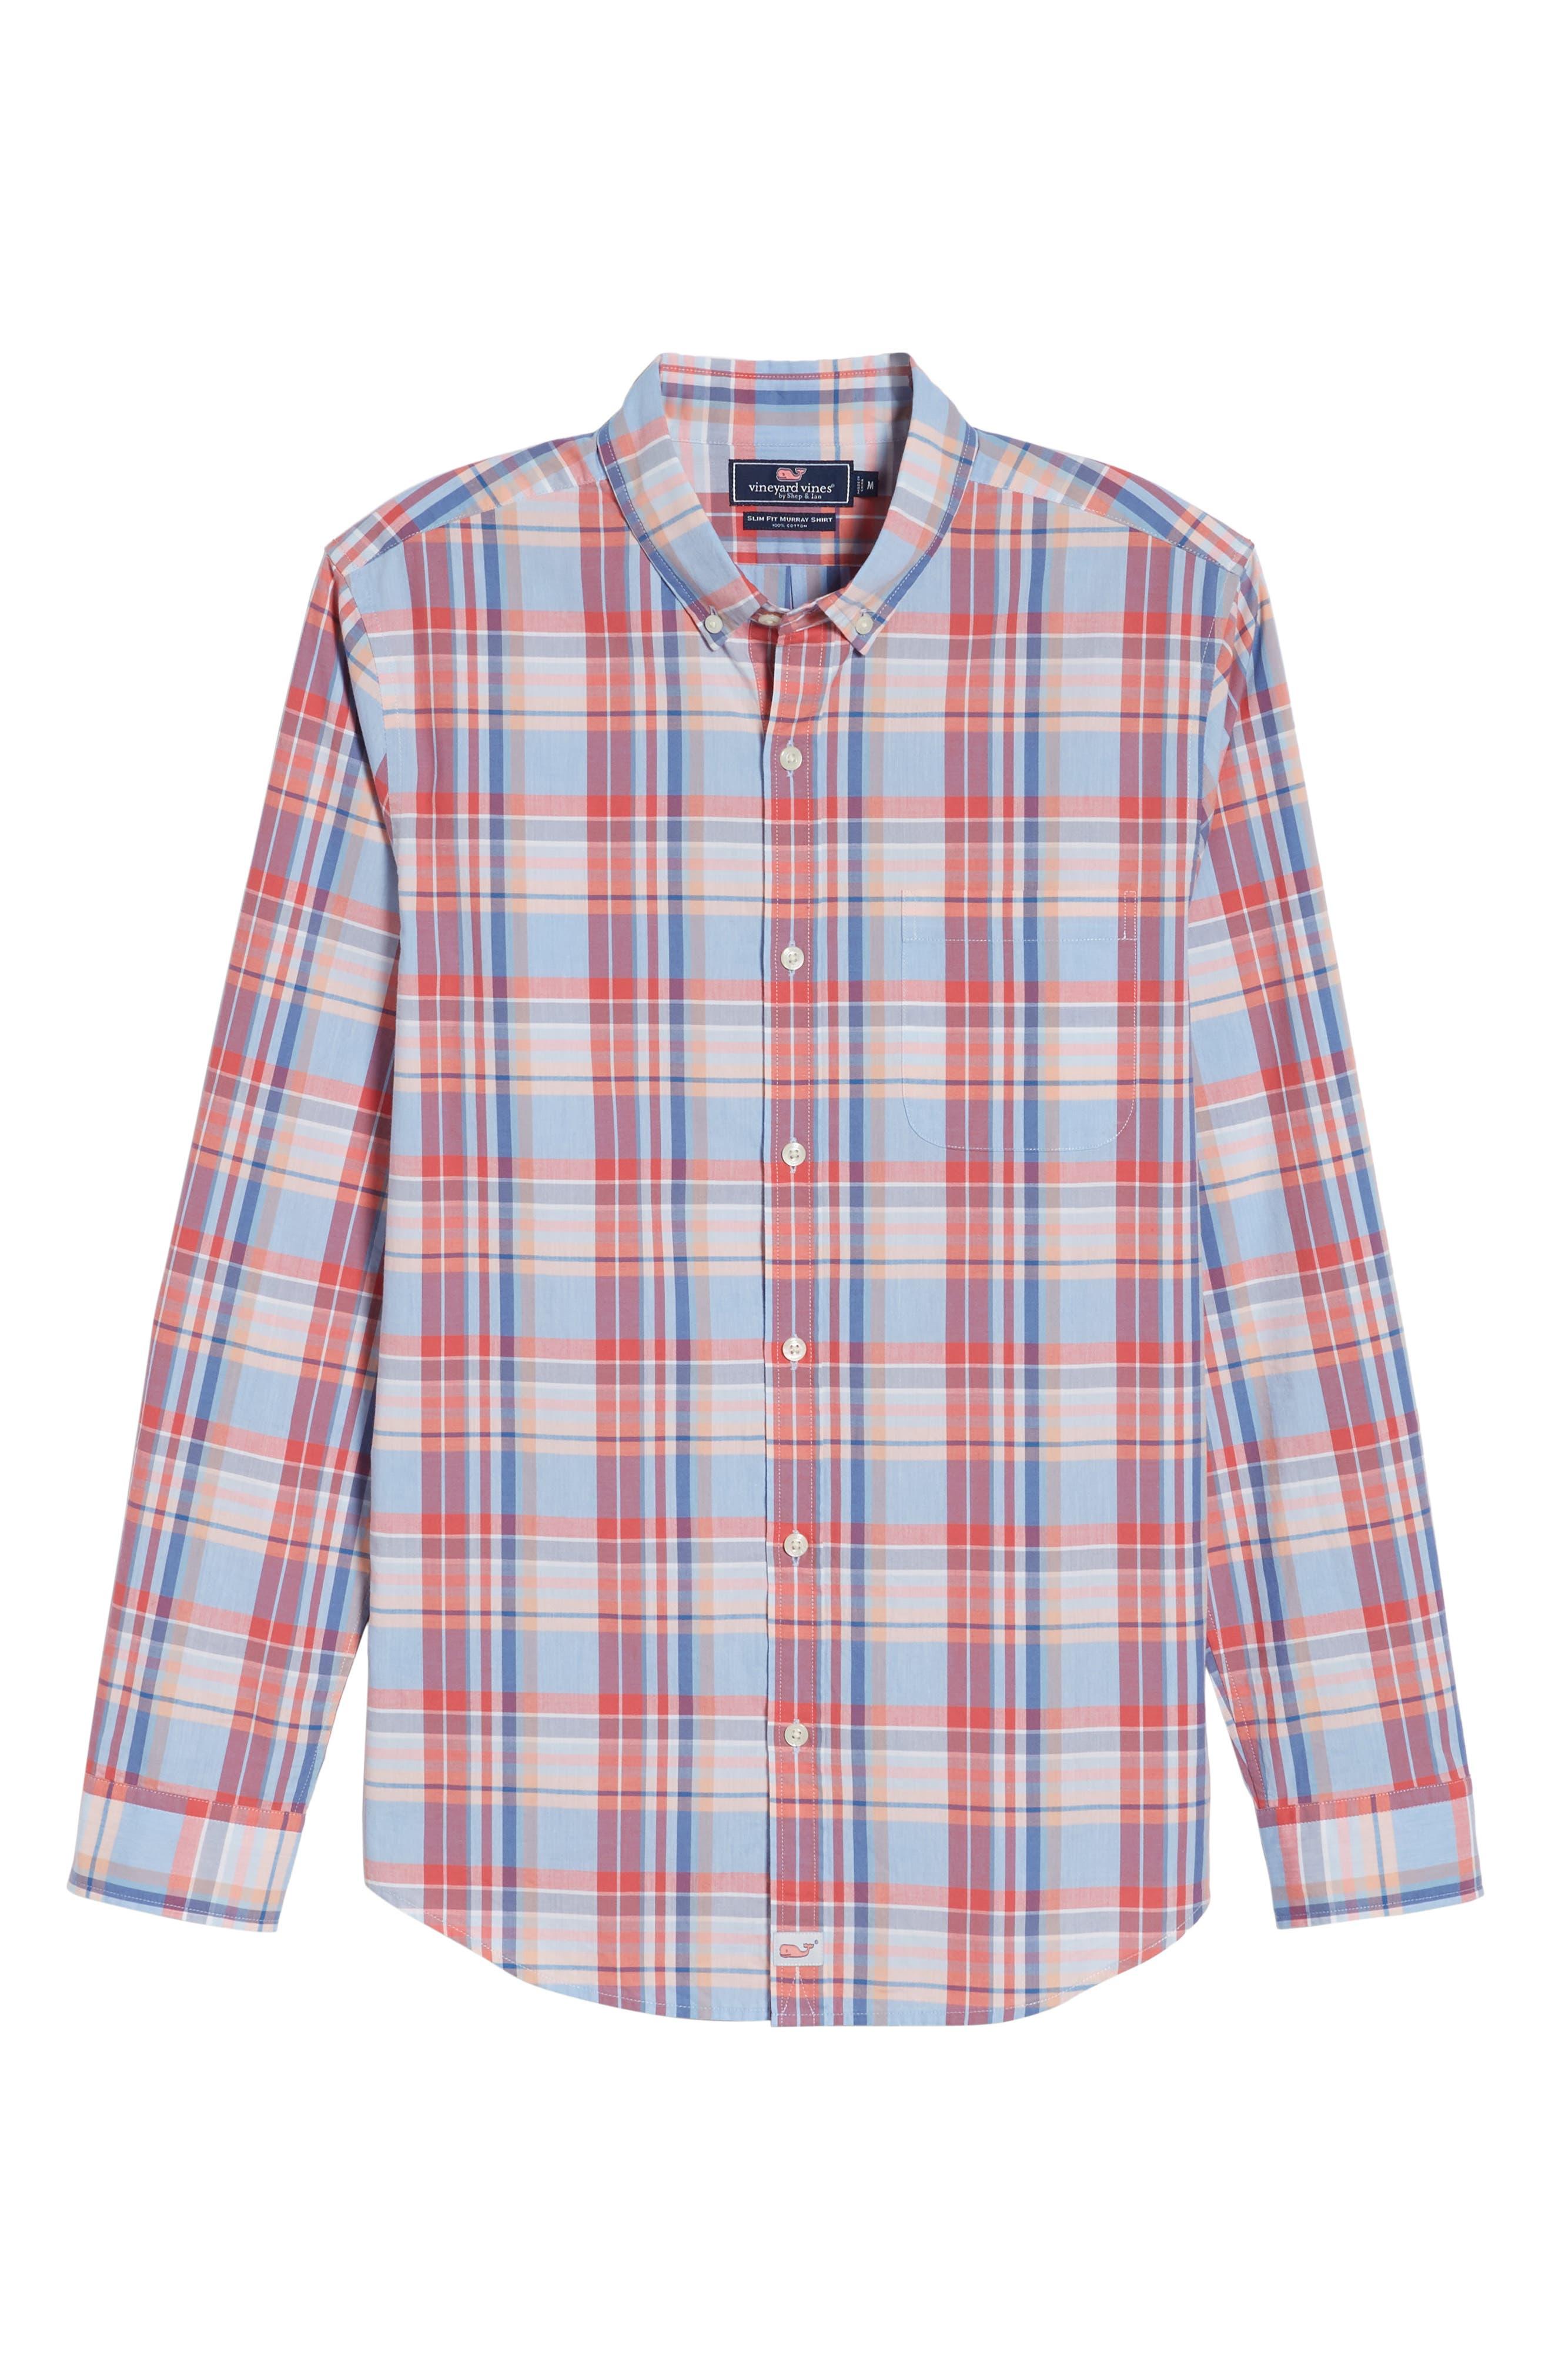 Fox Town Slim Fit Plaid Sport Shirt,                             Alternate thumbnail 6, color,                             628